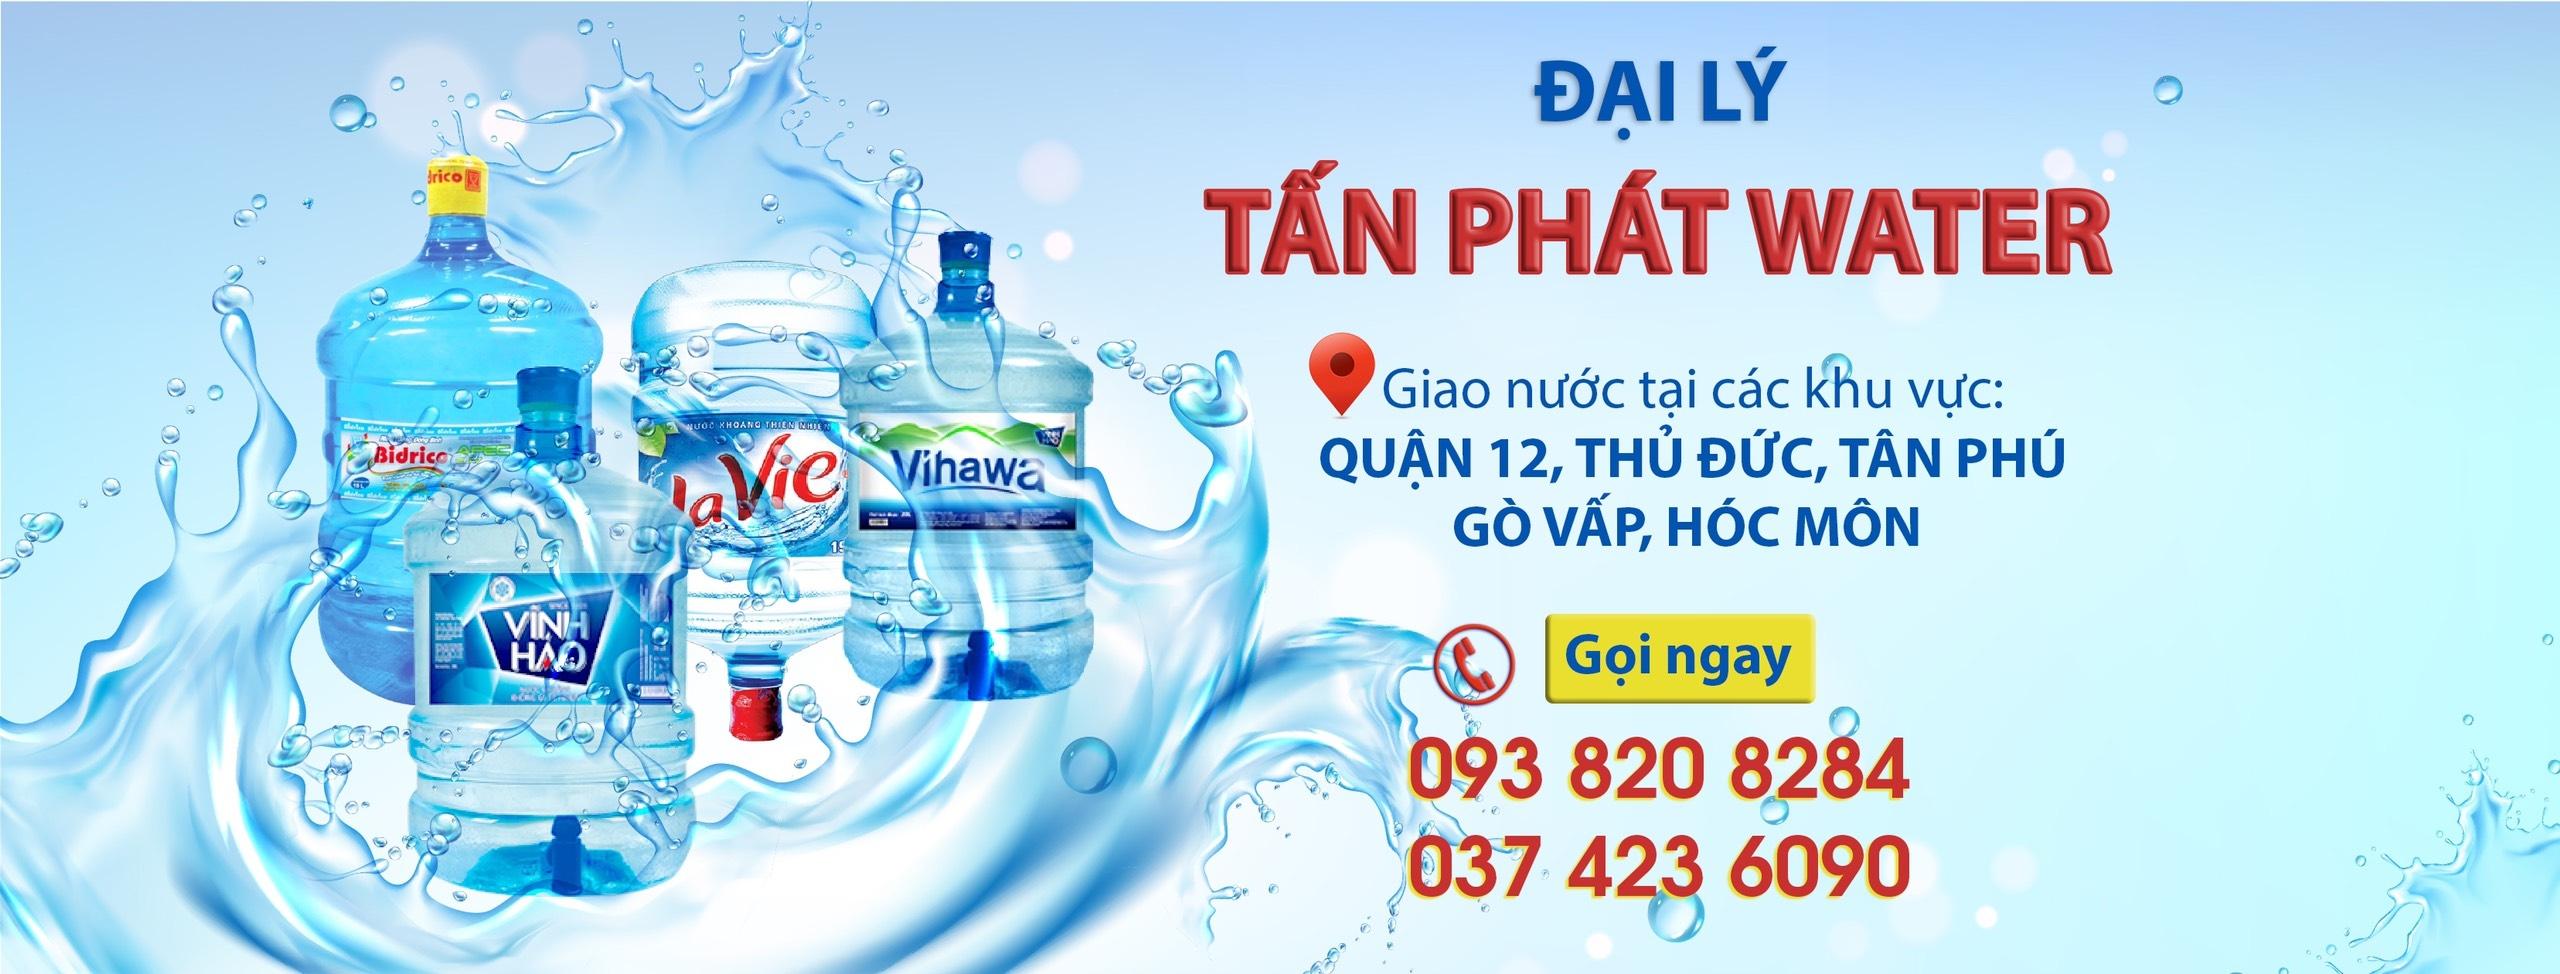 GIAO NƯỚC TẤN PHÁT WATER (@giaonuoc247spw) Cover Image